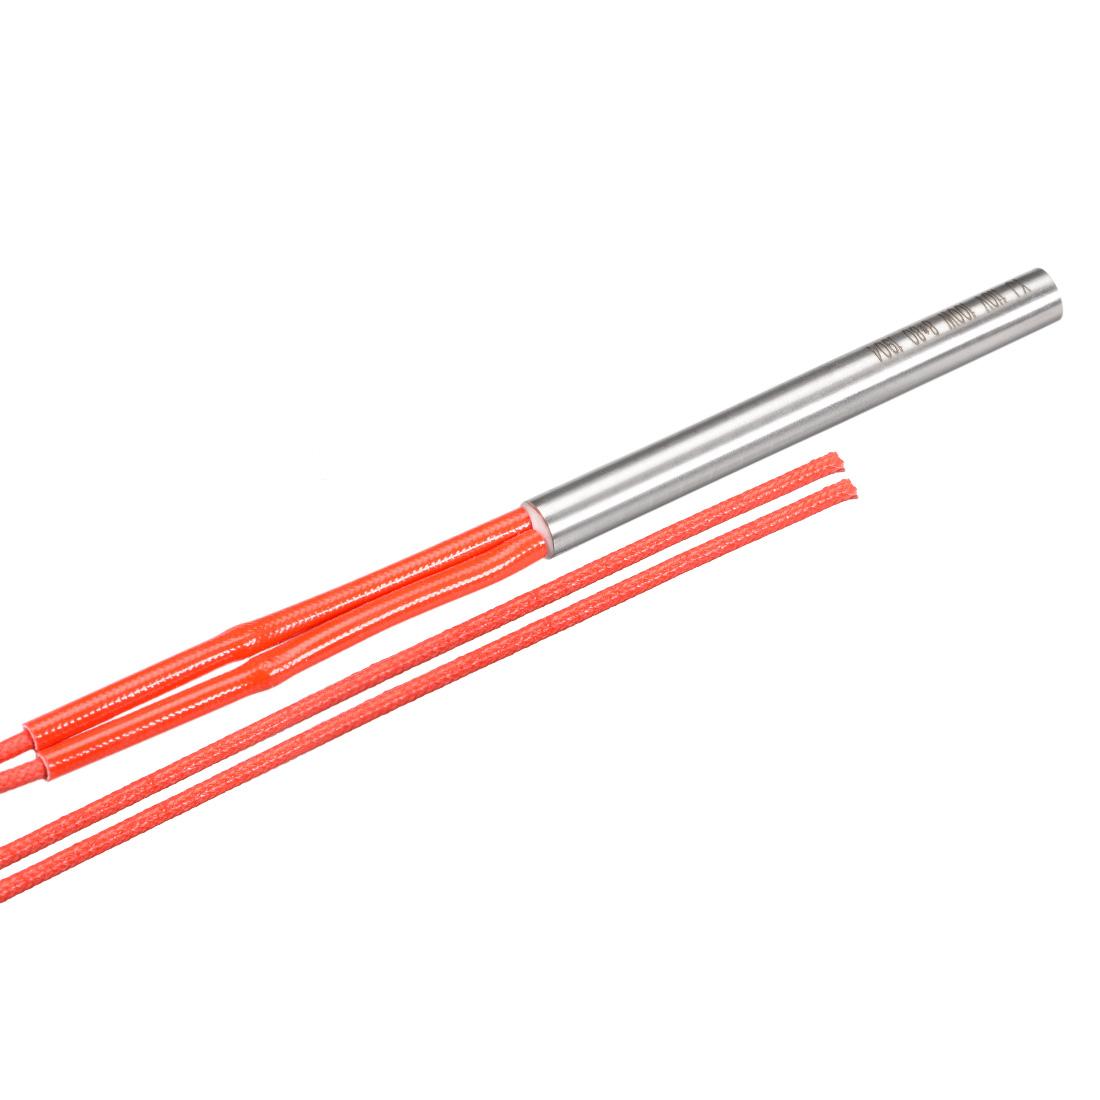 Cartridge Heater AC 110V 100 Watt Stainless Steel Heating Element Replacement